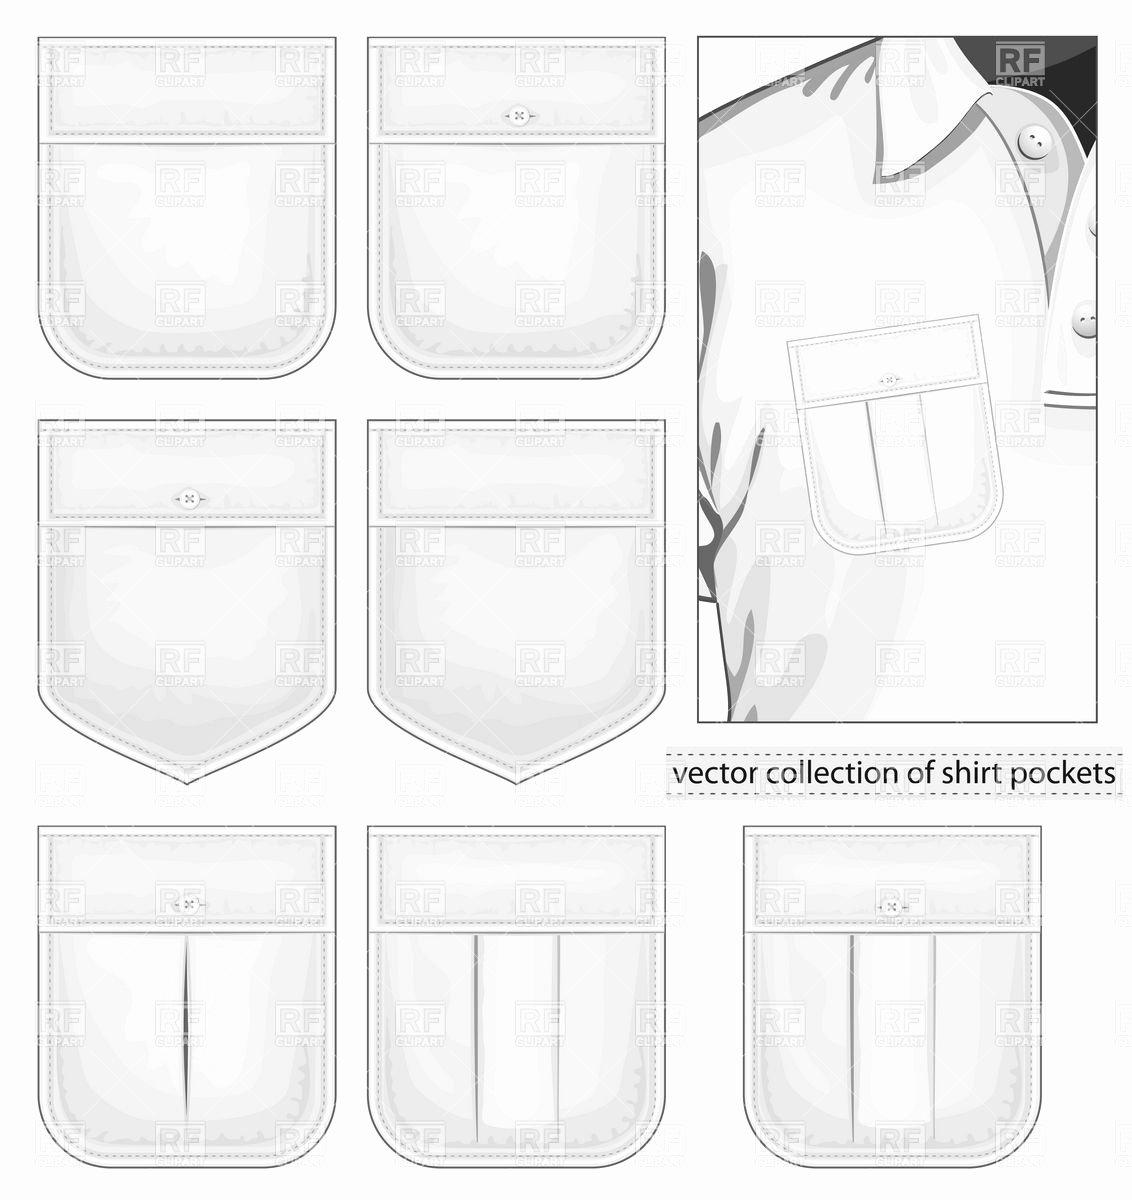 Pocket Shirt Template Fresh Collection Of Shirt Pockets Vector Image – Vector Artwork